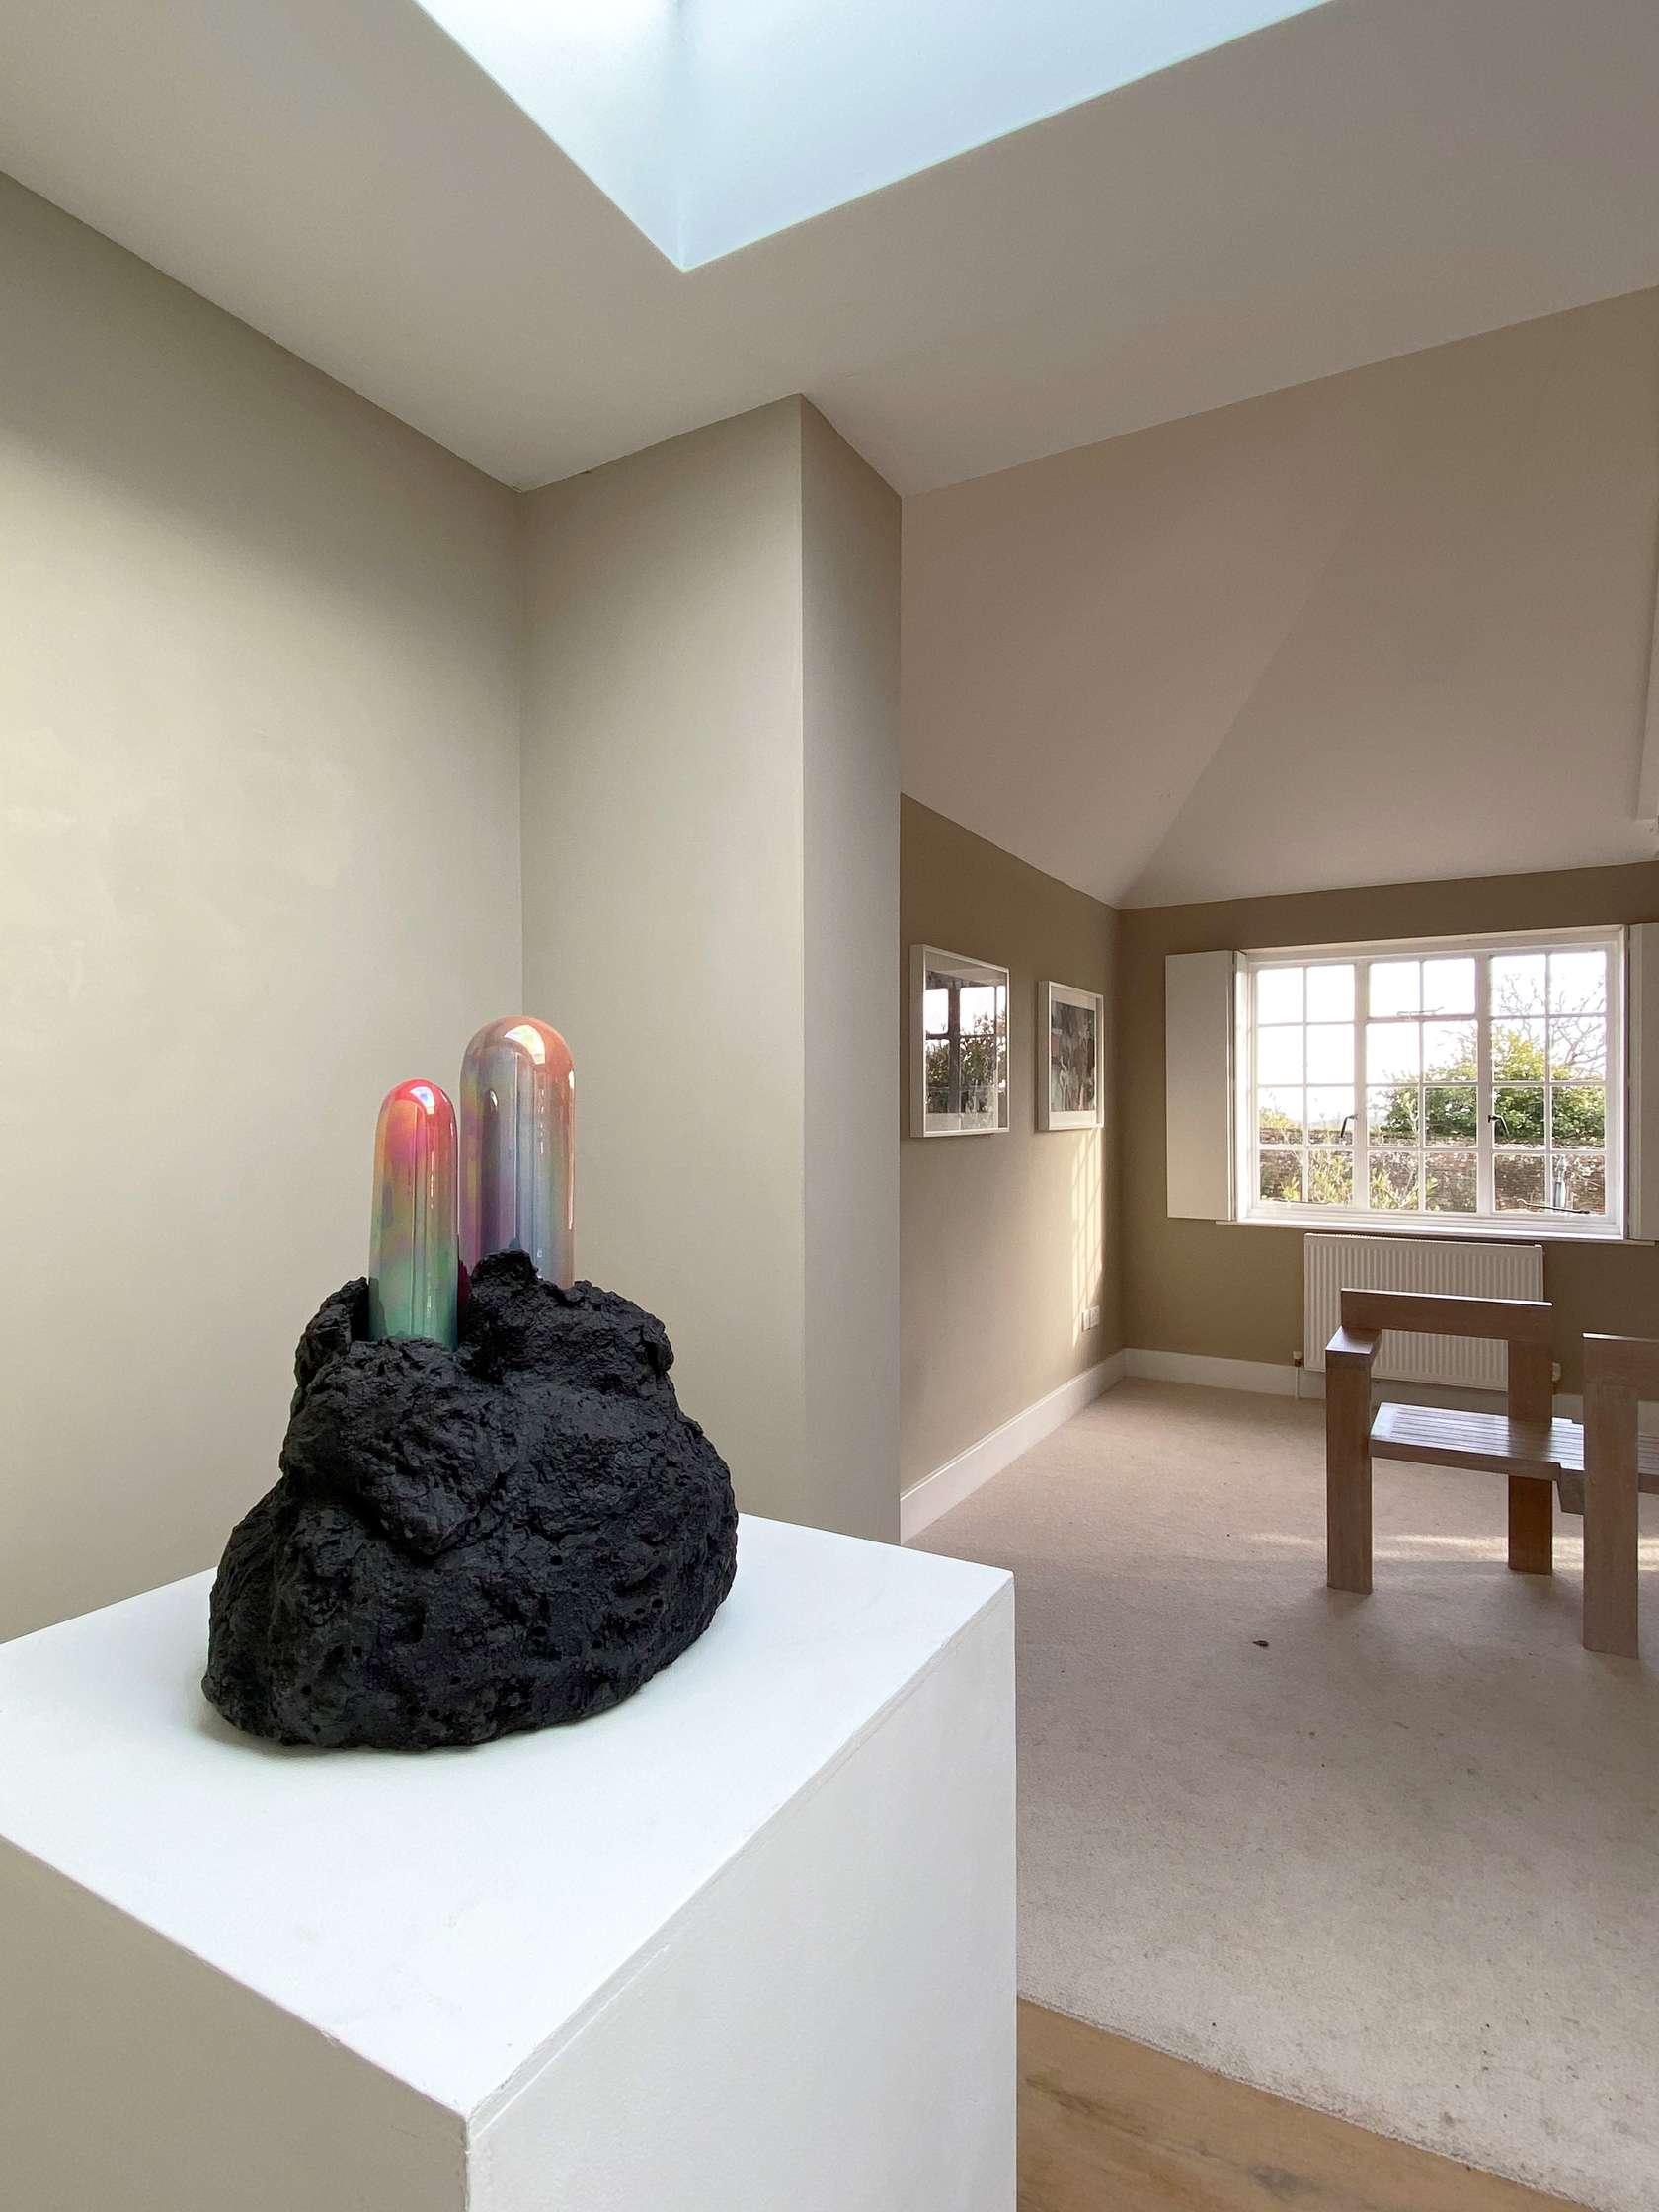 Psychotropics, New Art Centre, Salisbury (UK) 25 janvier - 22 mars 2020 © New Art Centre